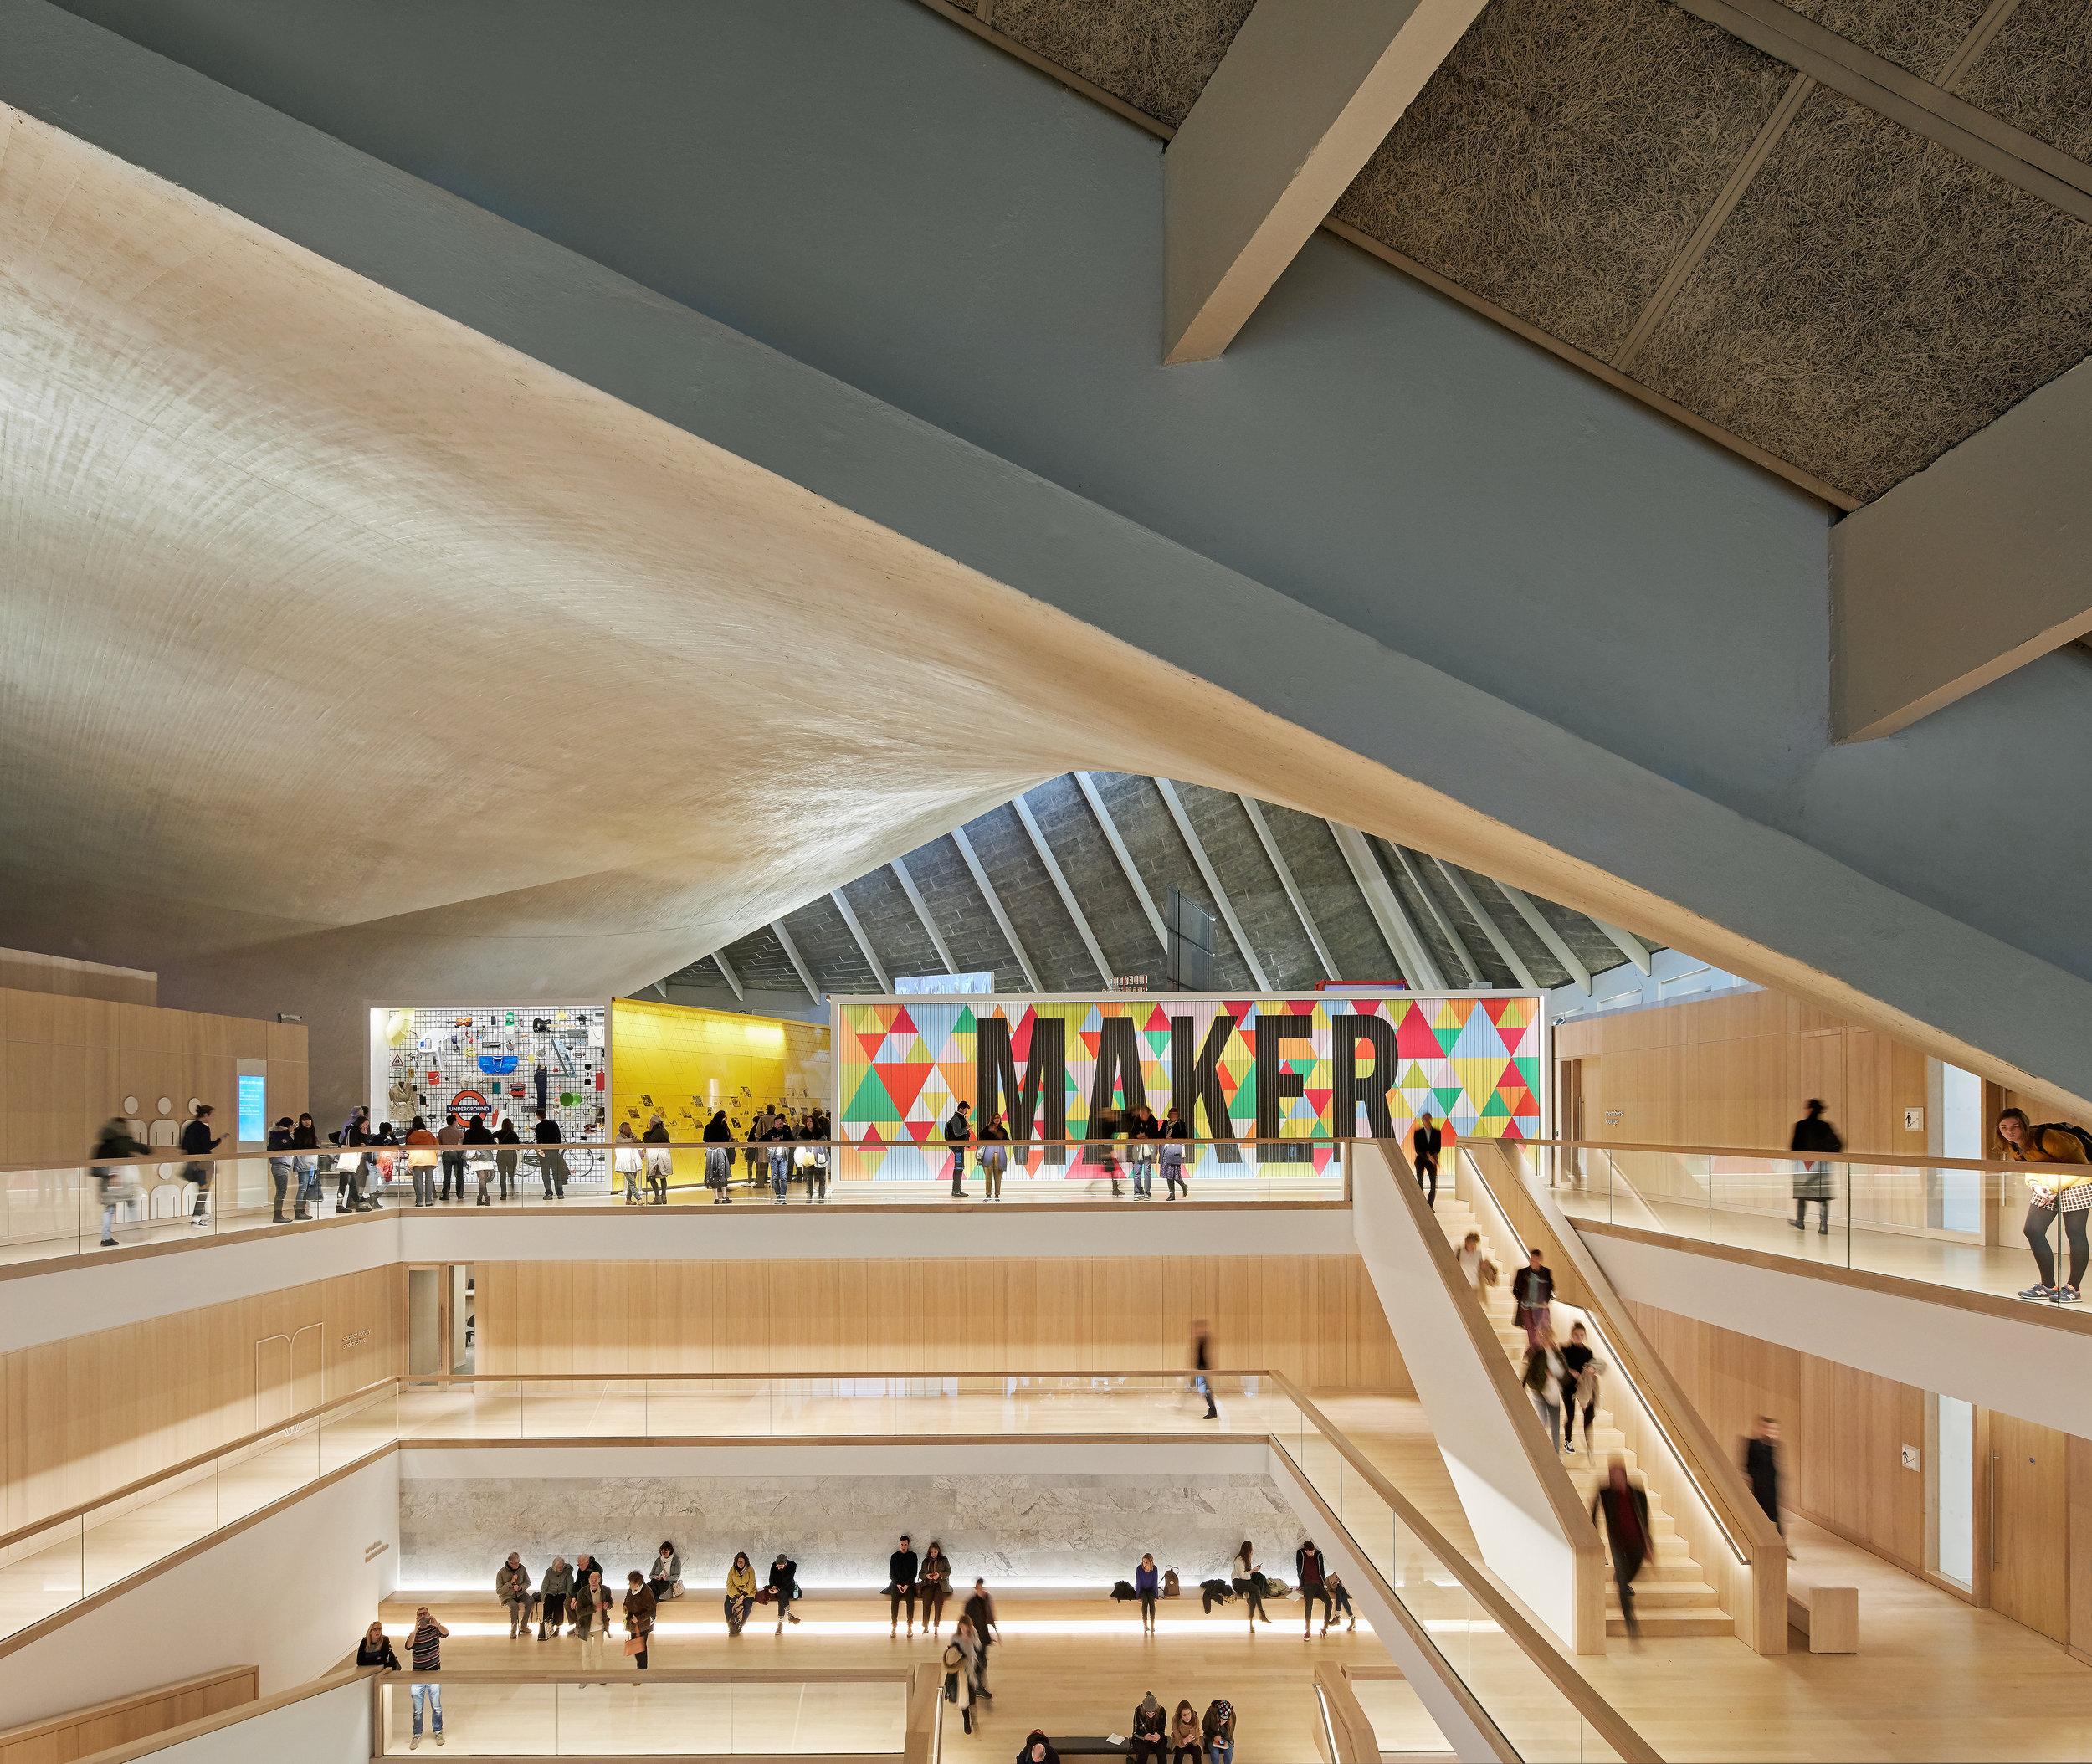 Image courtesy of Design Museum. © Hufton + Crow